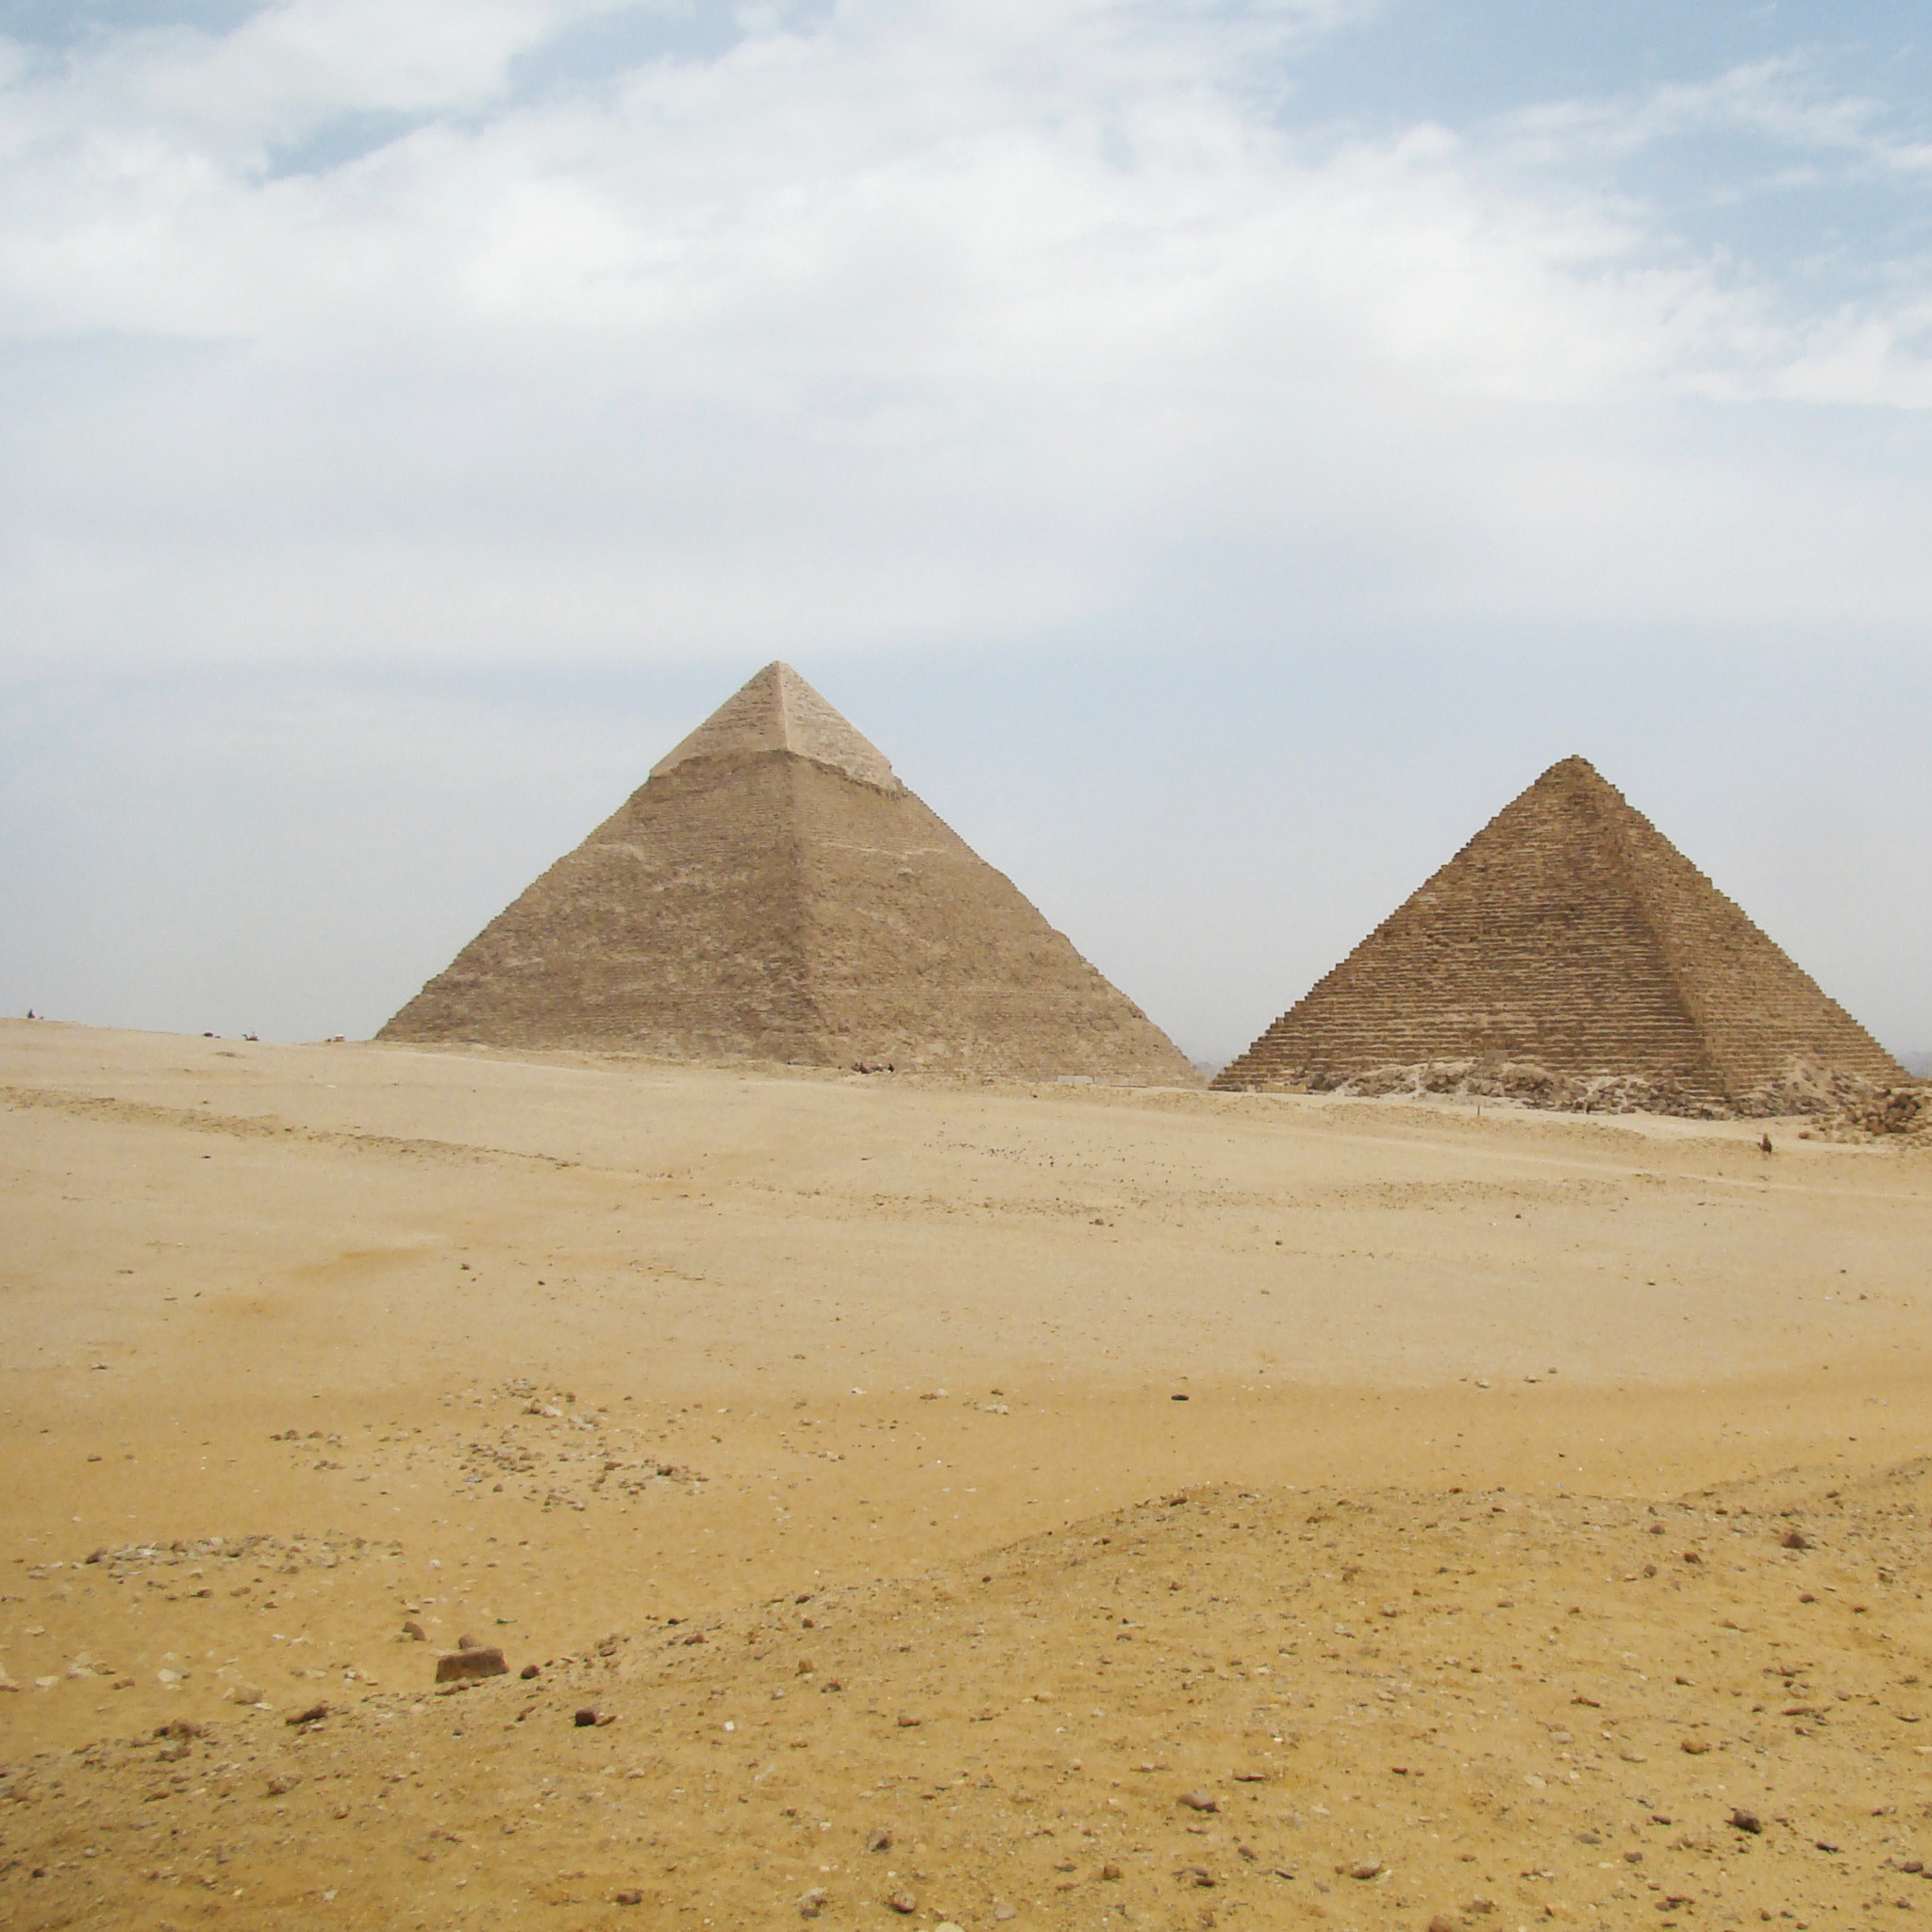 Egypt Wallpaper: Egyptian Pyramid Wallpaper (54+ Images